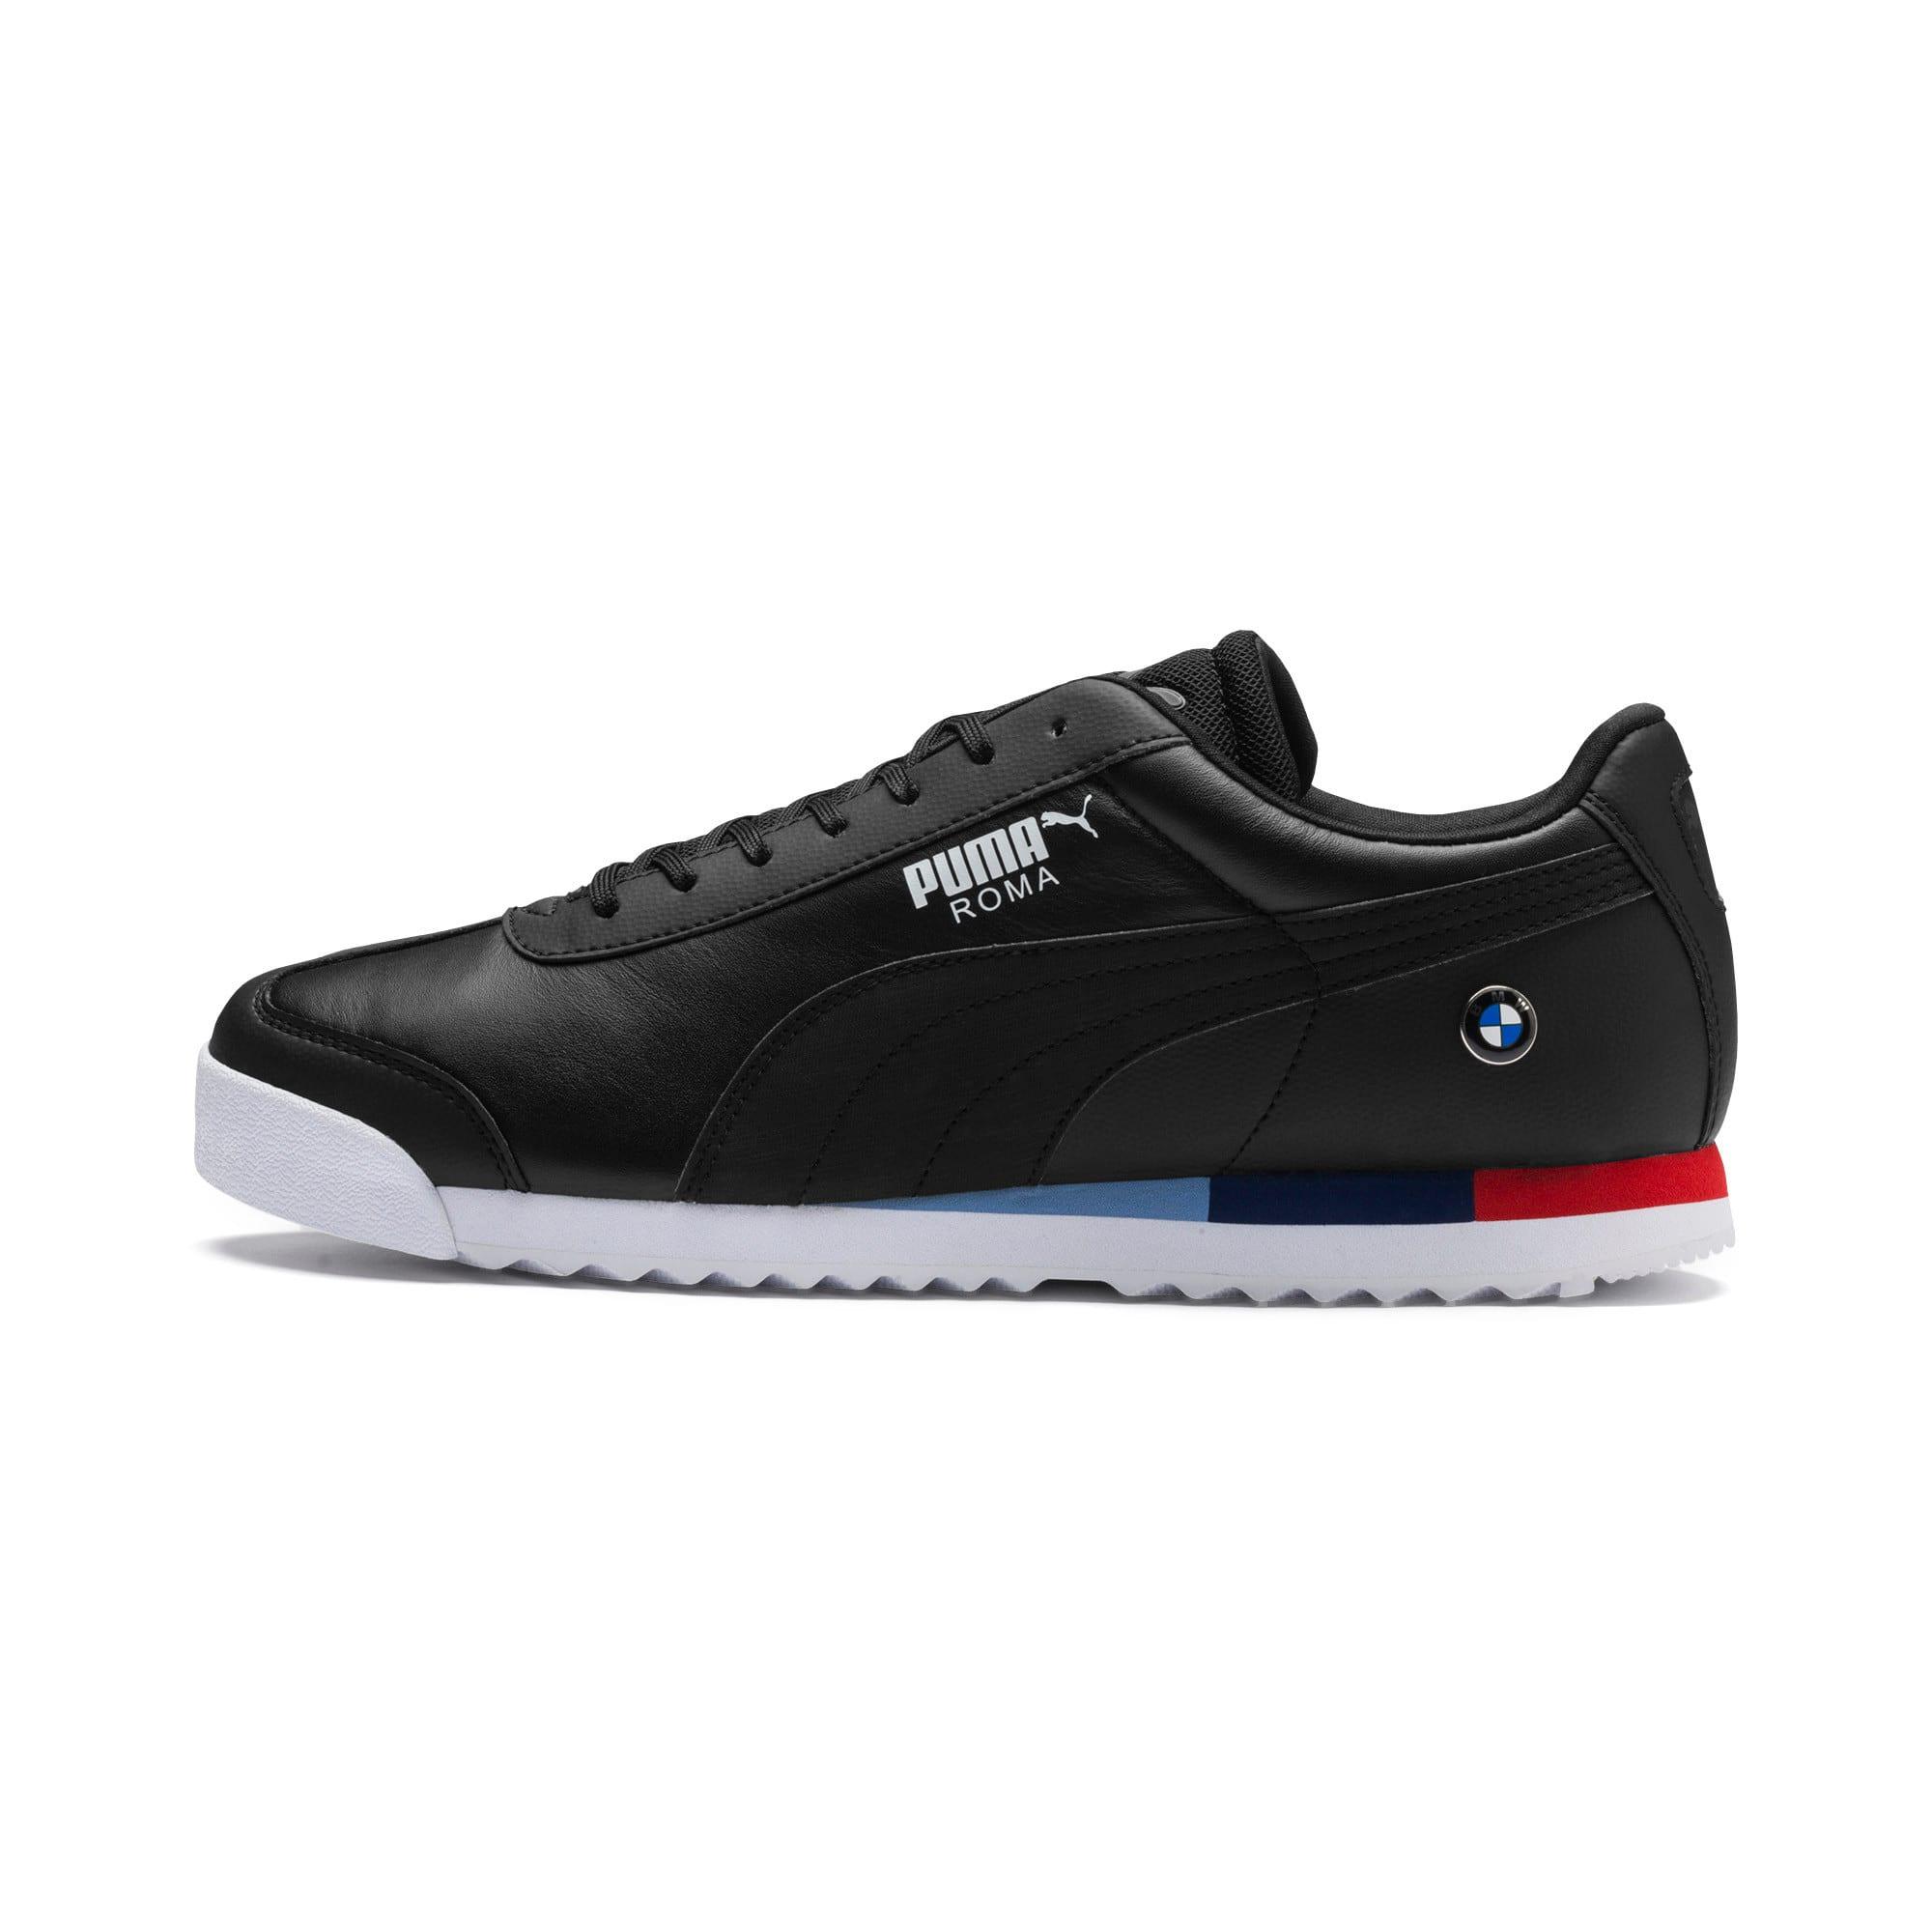 Thumbnail 1 of BMW MMS Roma sneakers voor heren, Puma Black-Puma Black, medium